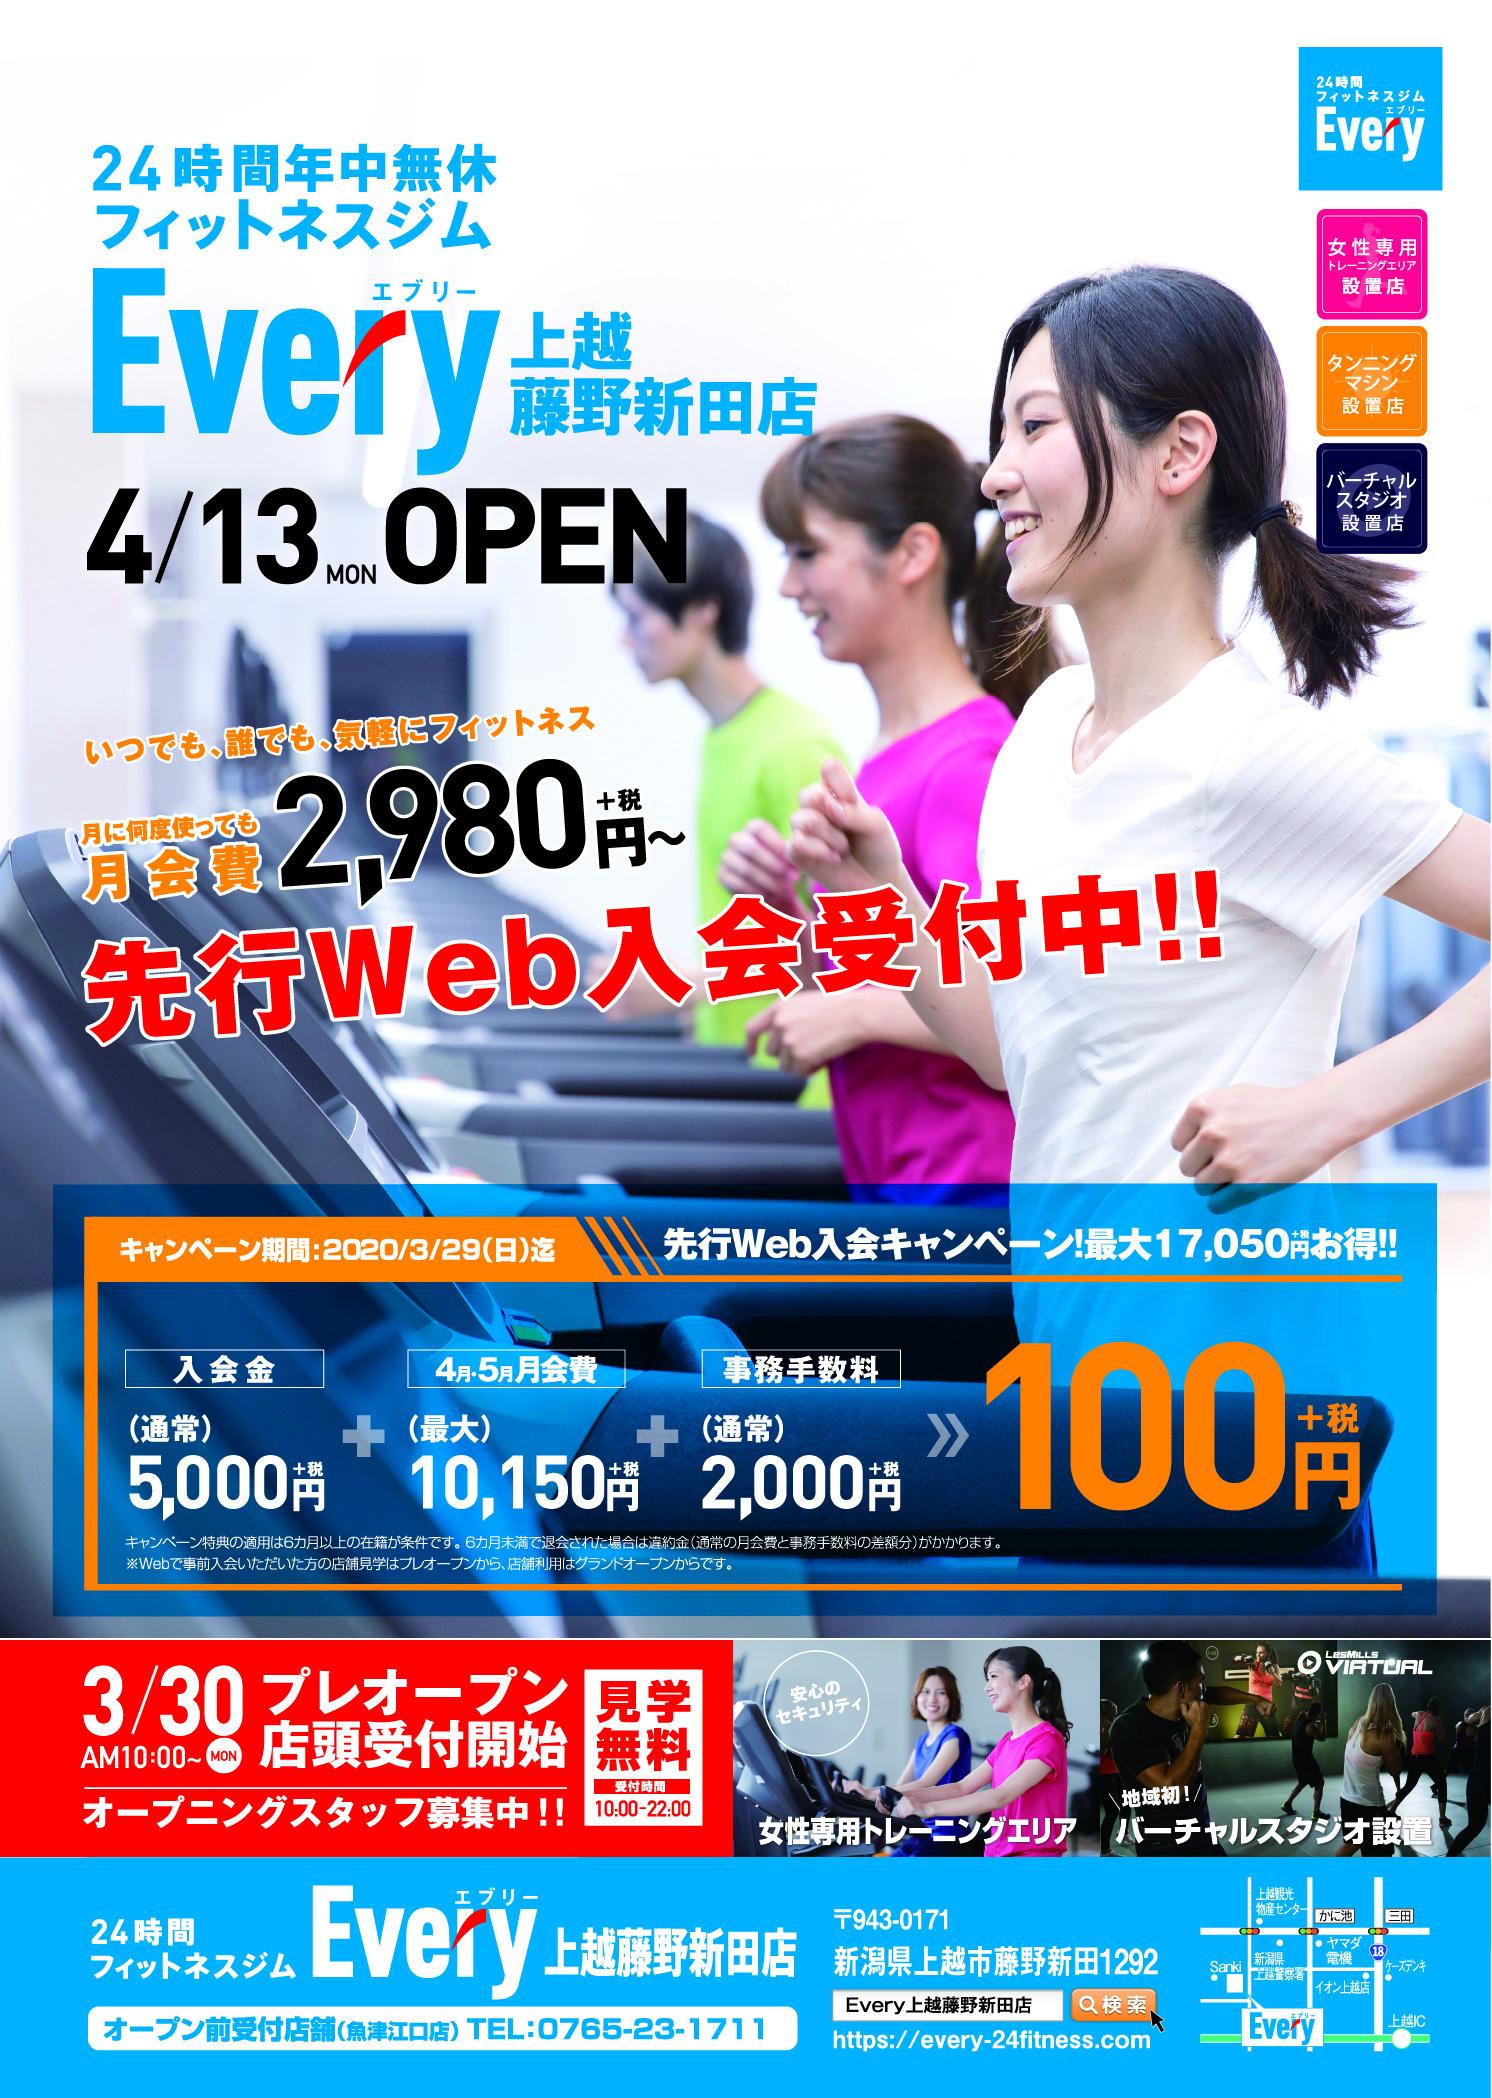 Every 上越藤野新田店 先行Web入会受付中 | チラシ(表) | 24時間フィットネスジム「Every」